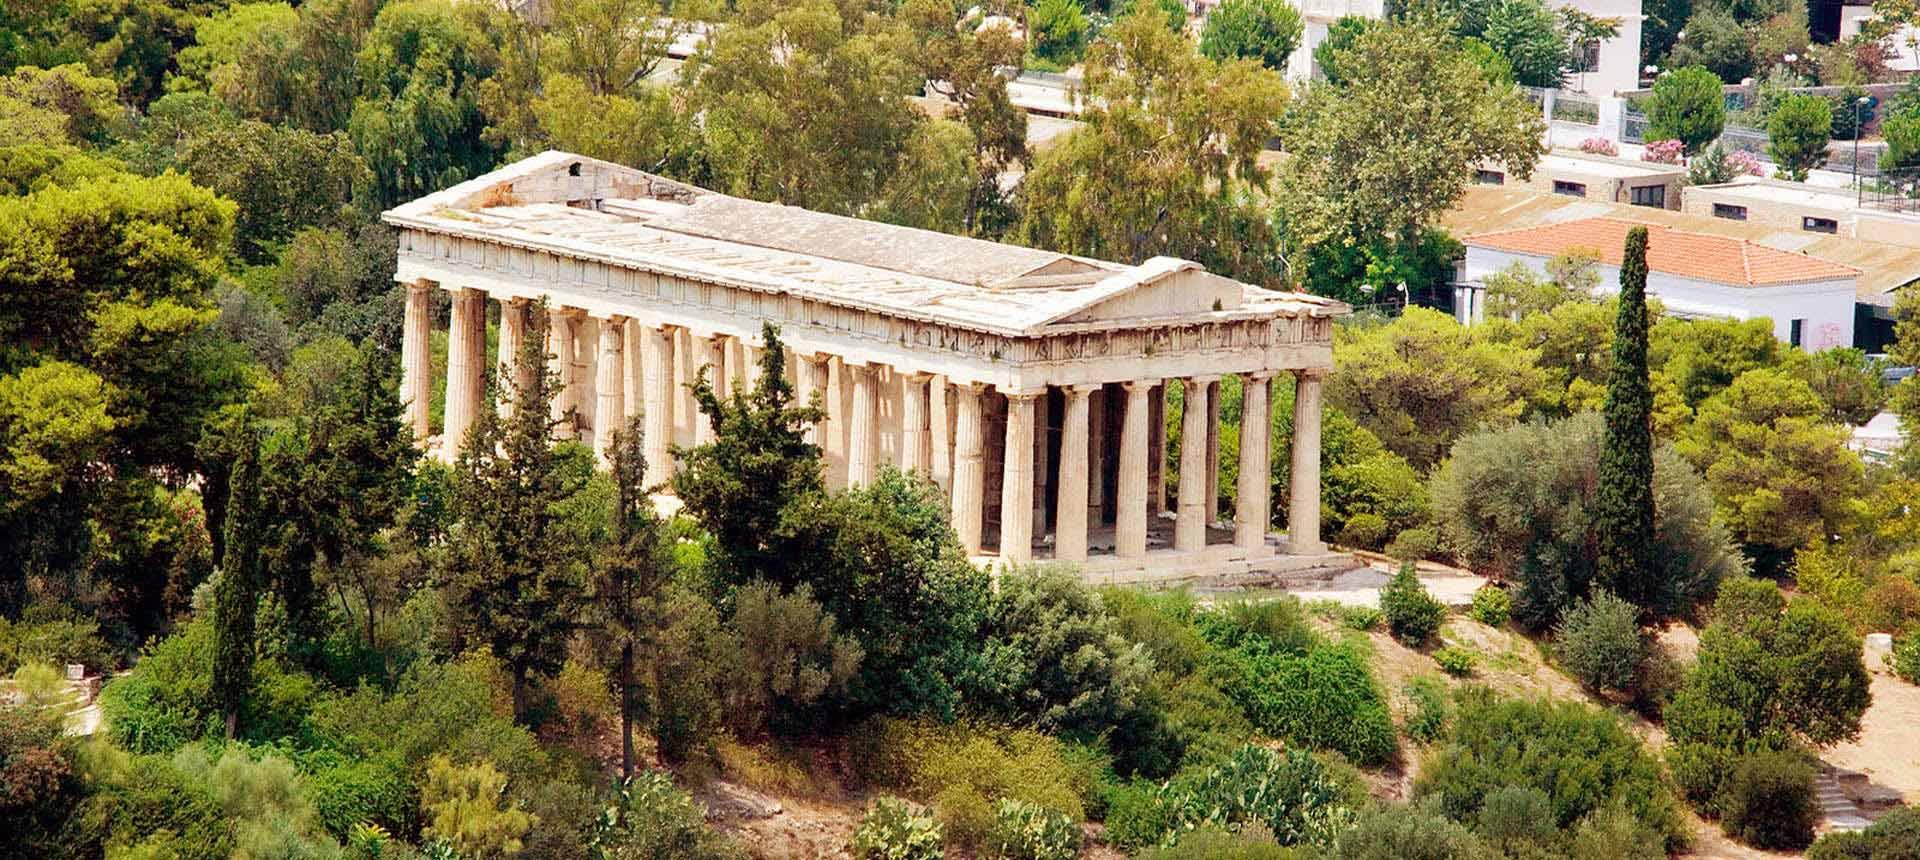 Acropolis, Ancient Agora and the Agora Museum